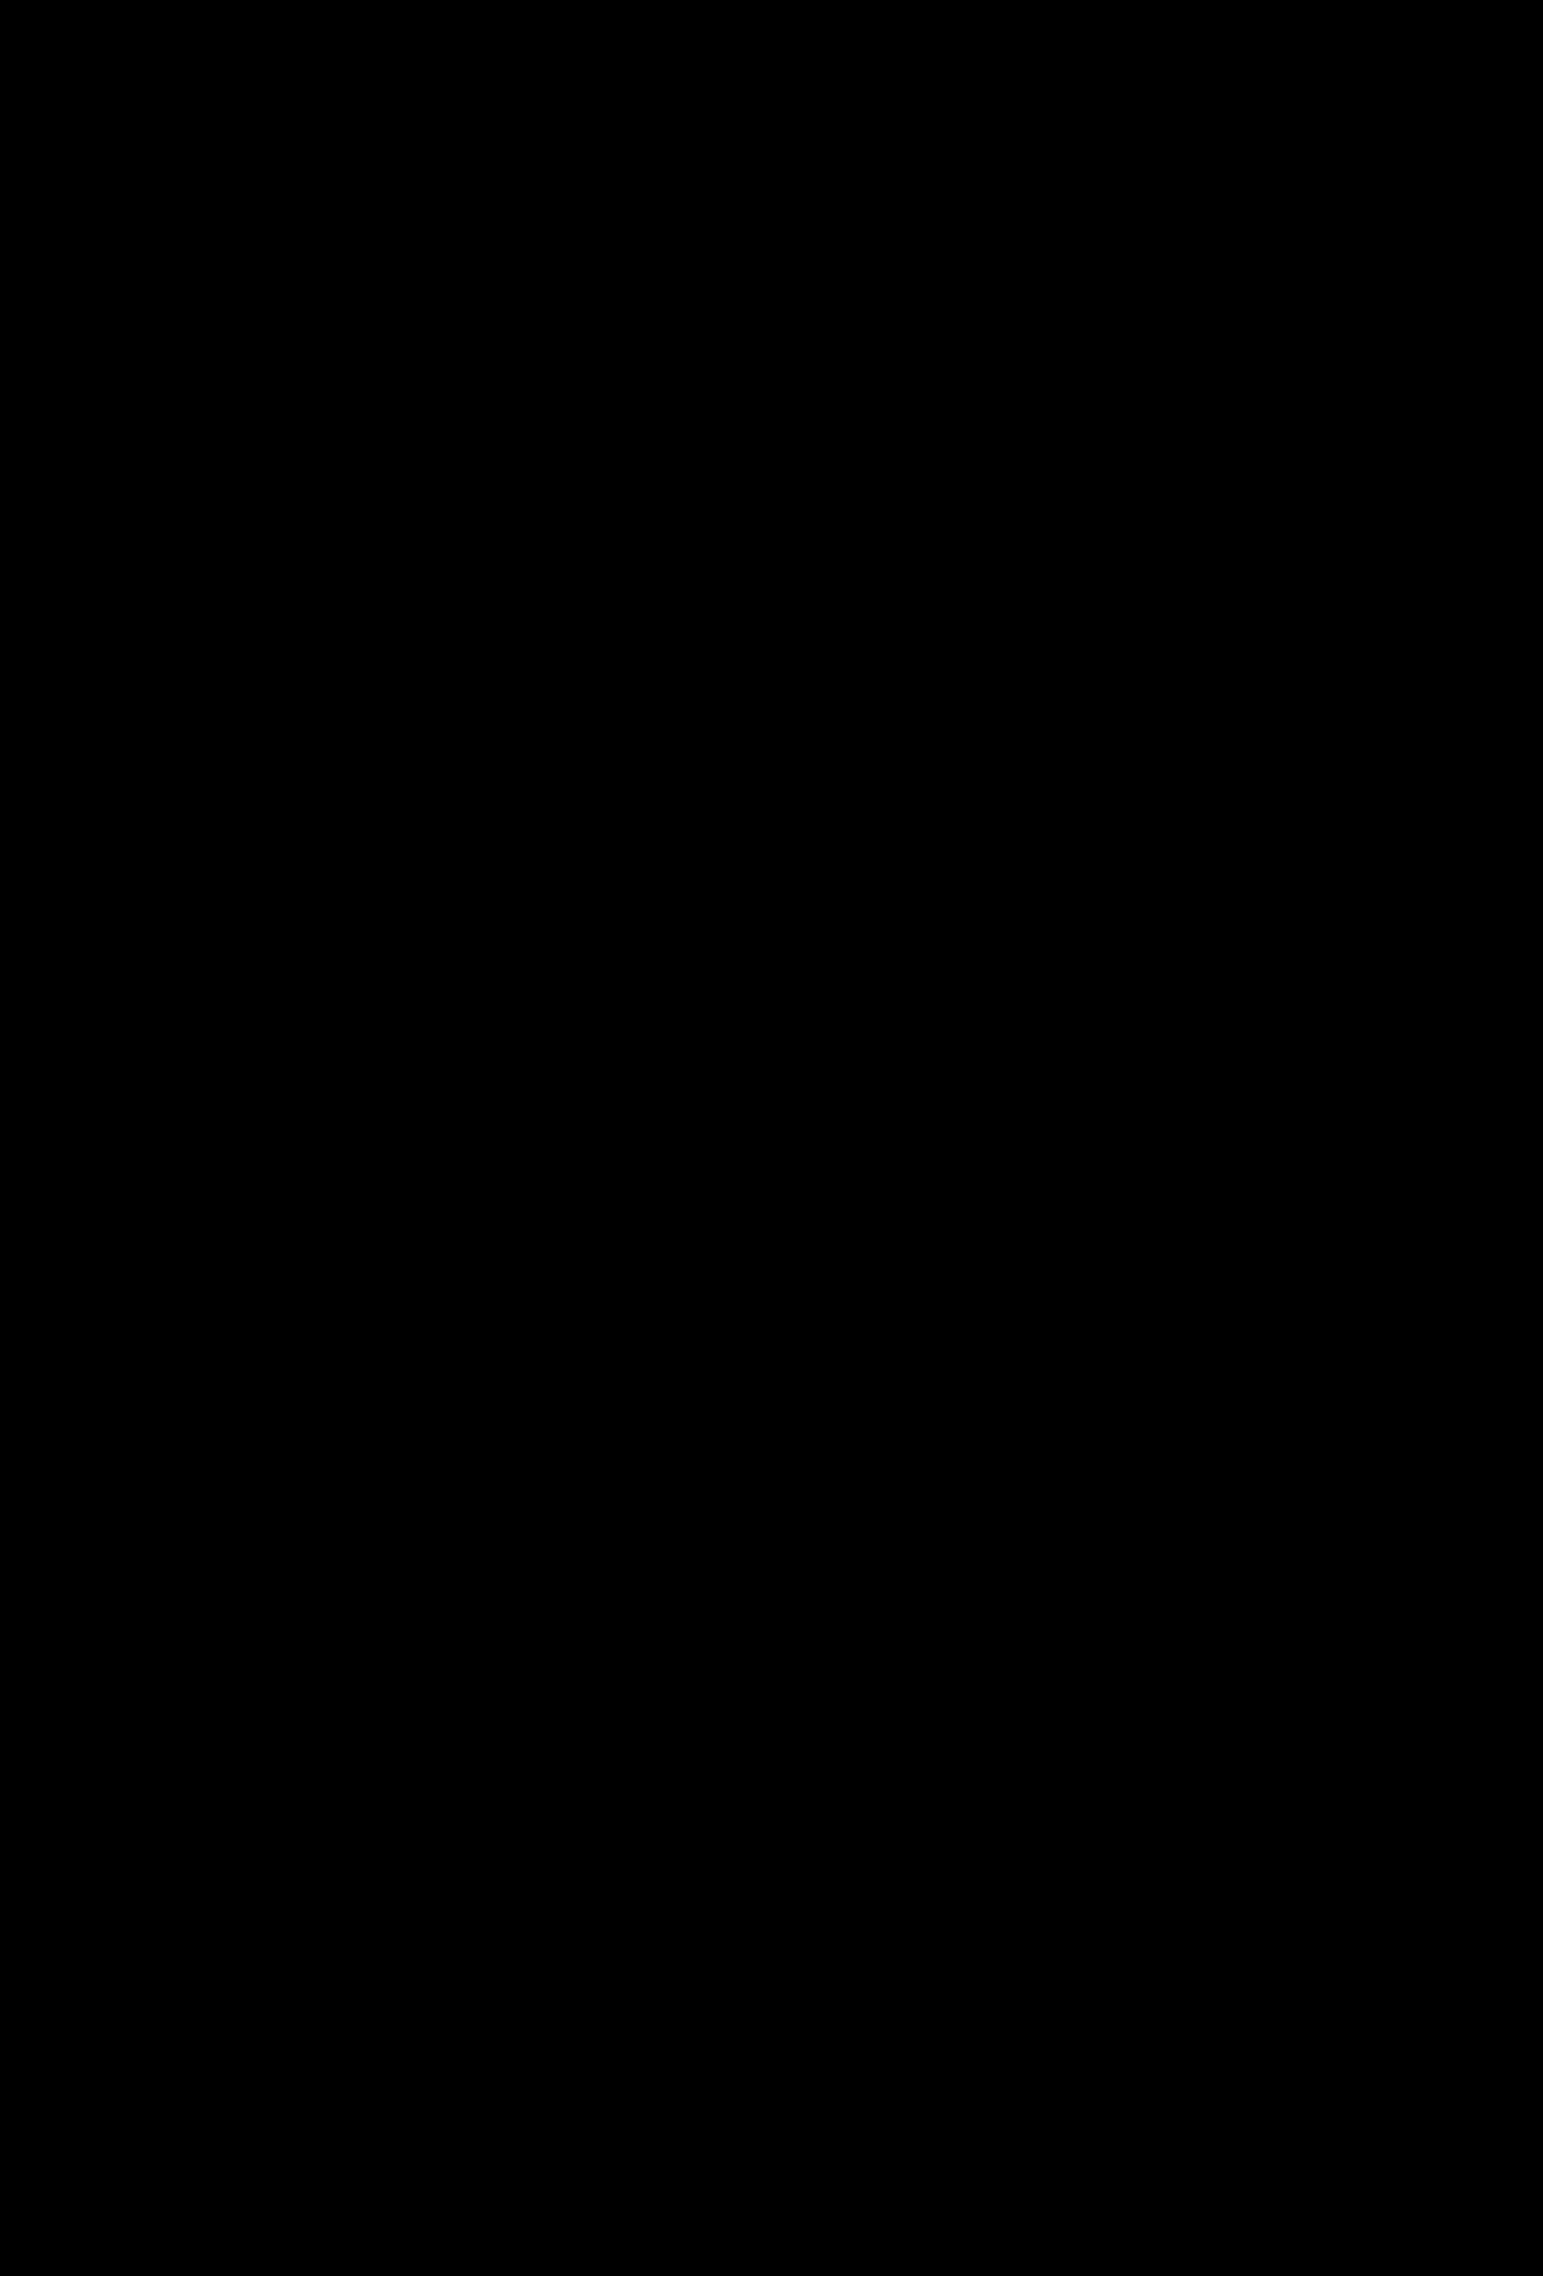 1543x2276 Clipart